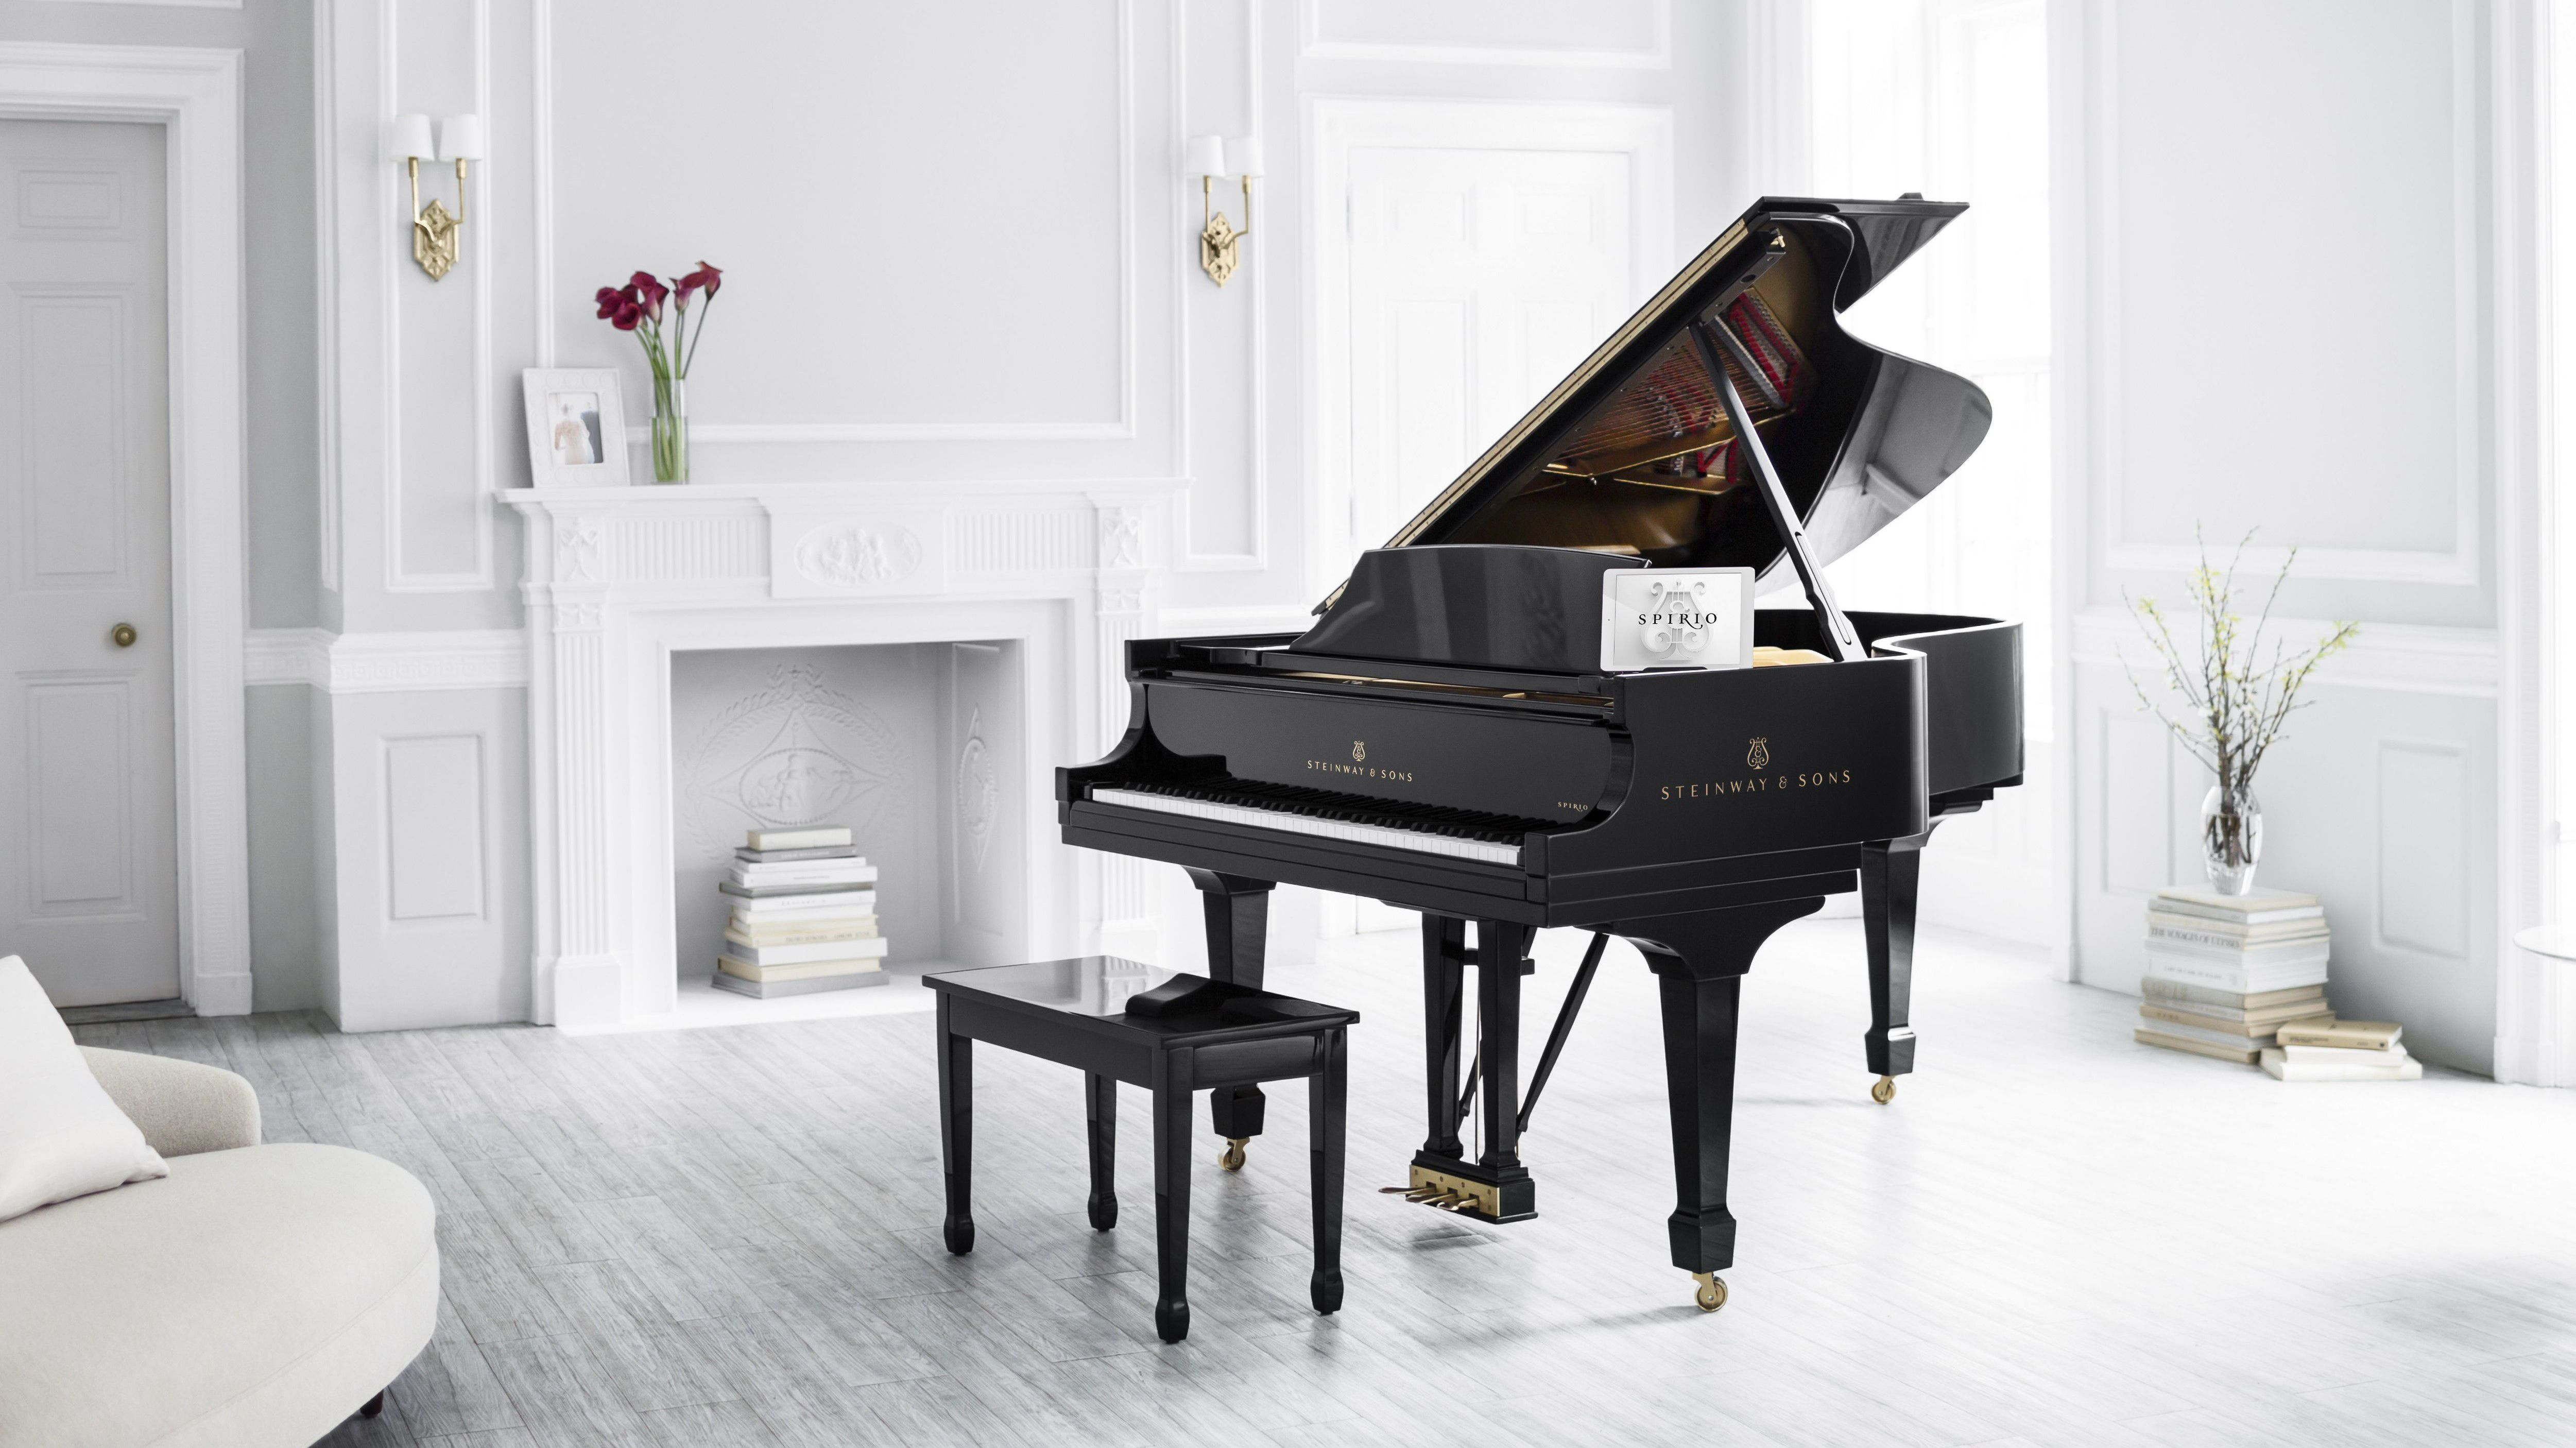 steinway fl gel als pianola mit ipad steuerung mac i. Black Bedroom Furniture Sets. Home Design Ideas